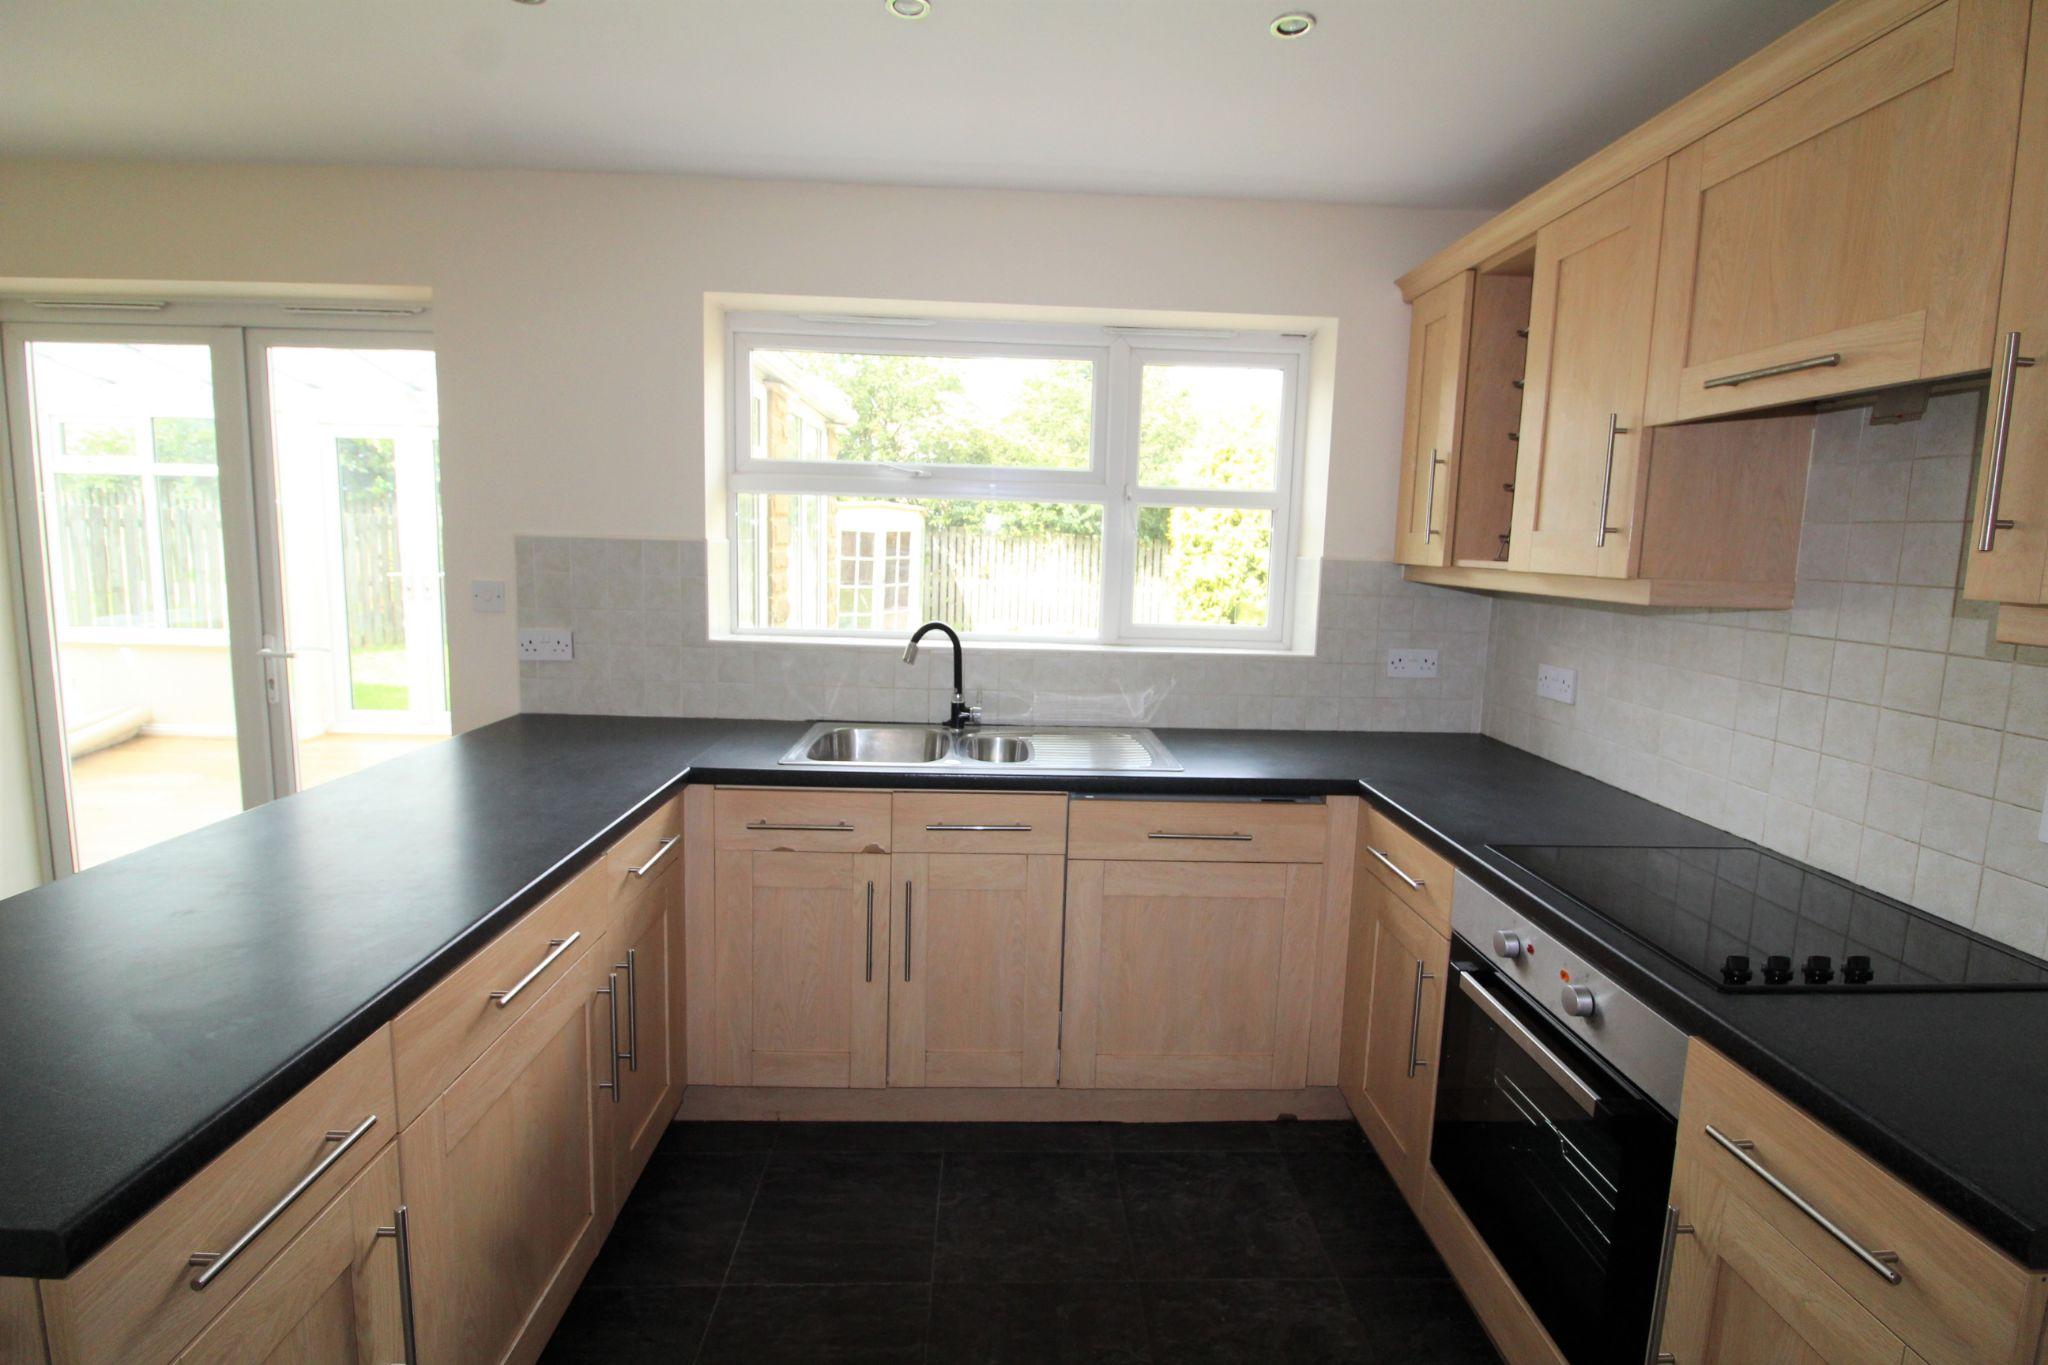 7 bedroom detached house Sale Agreed in Sunniside - Kitchen.